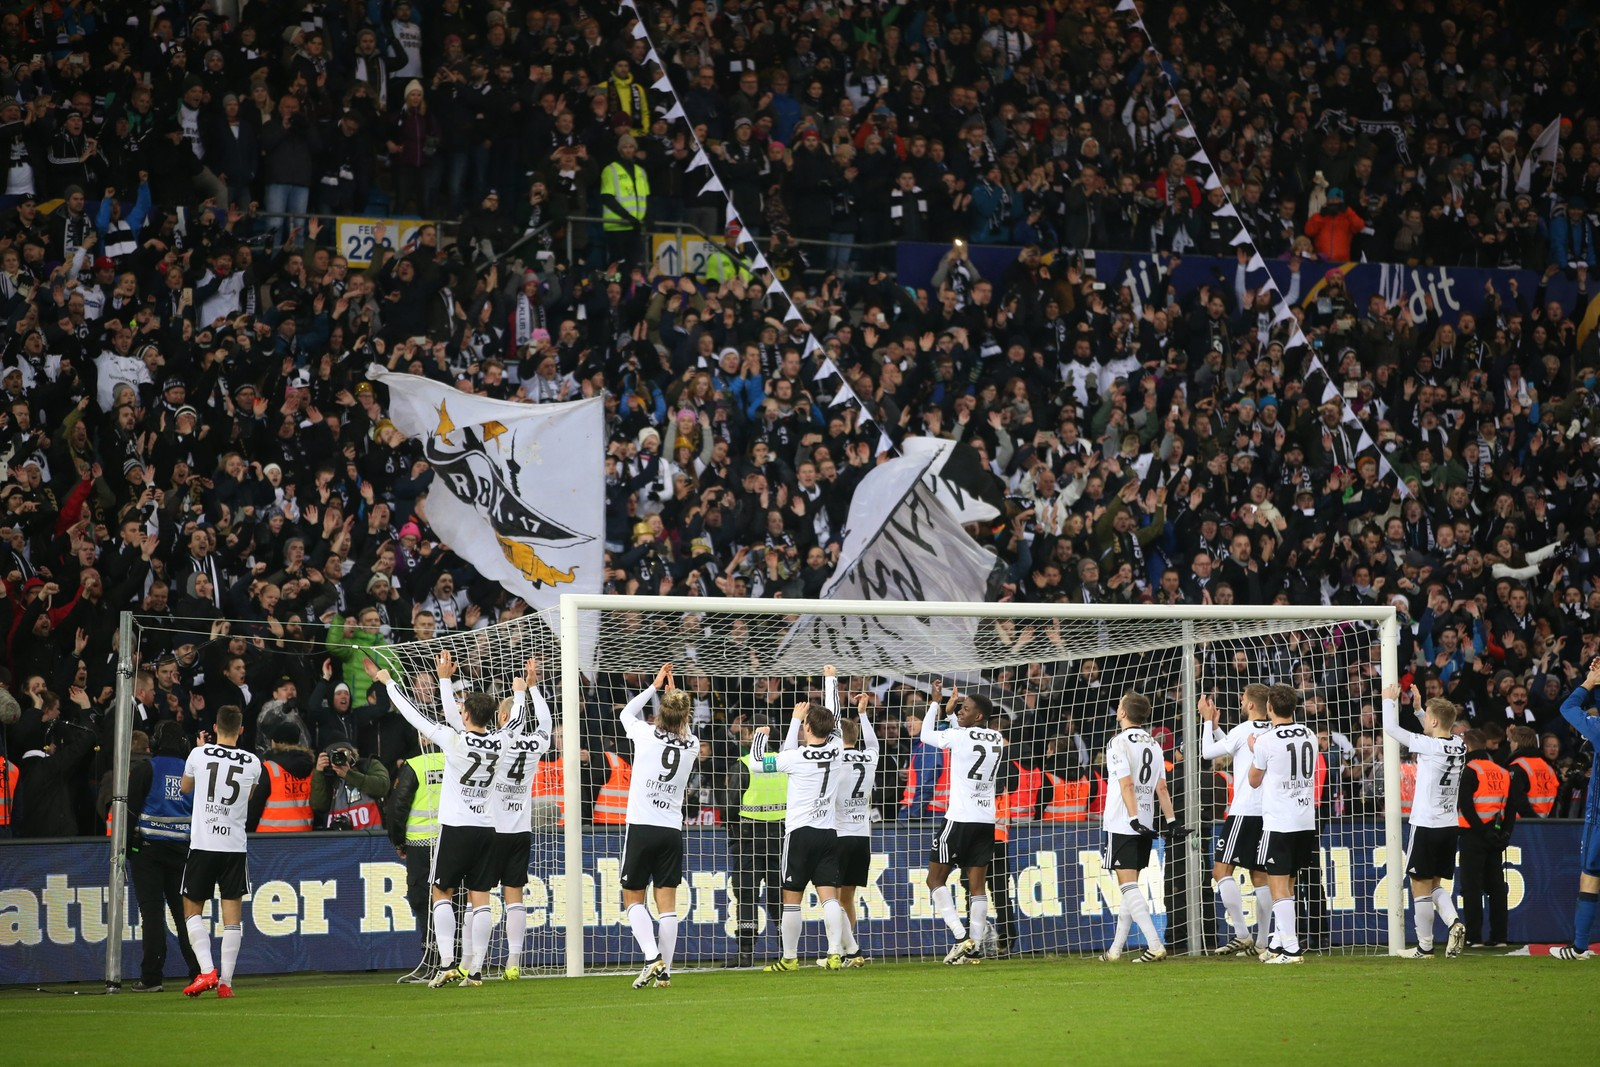 Rosenborgspillerne takker supporterne.